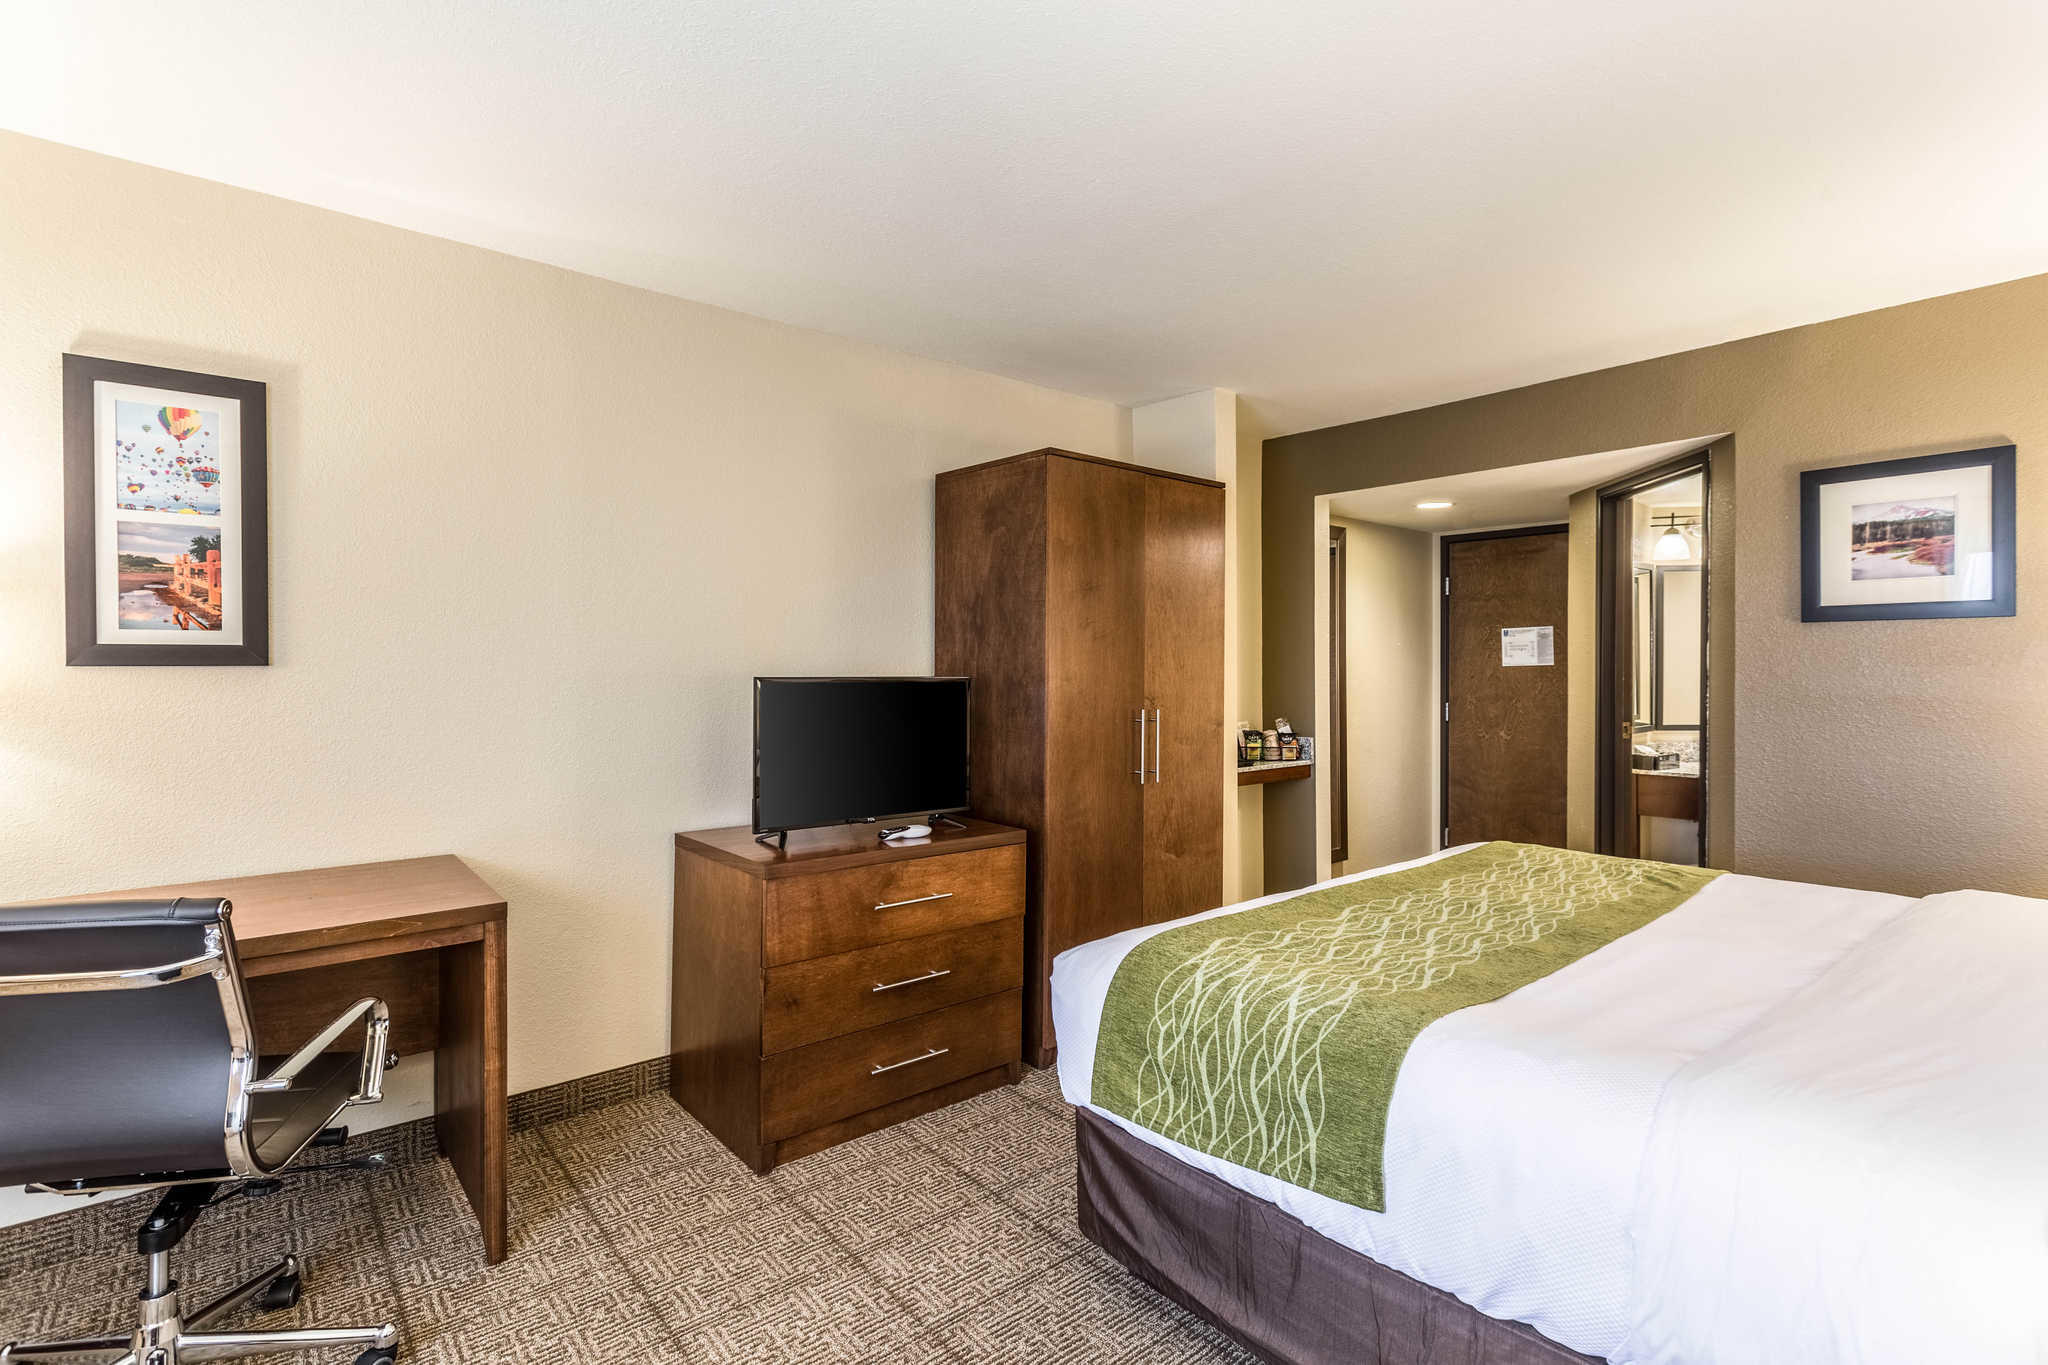 Comfort Inn & Suites Albuquerque Downtown image 12